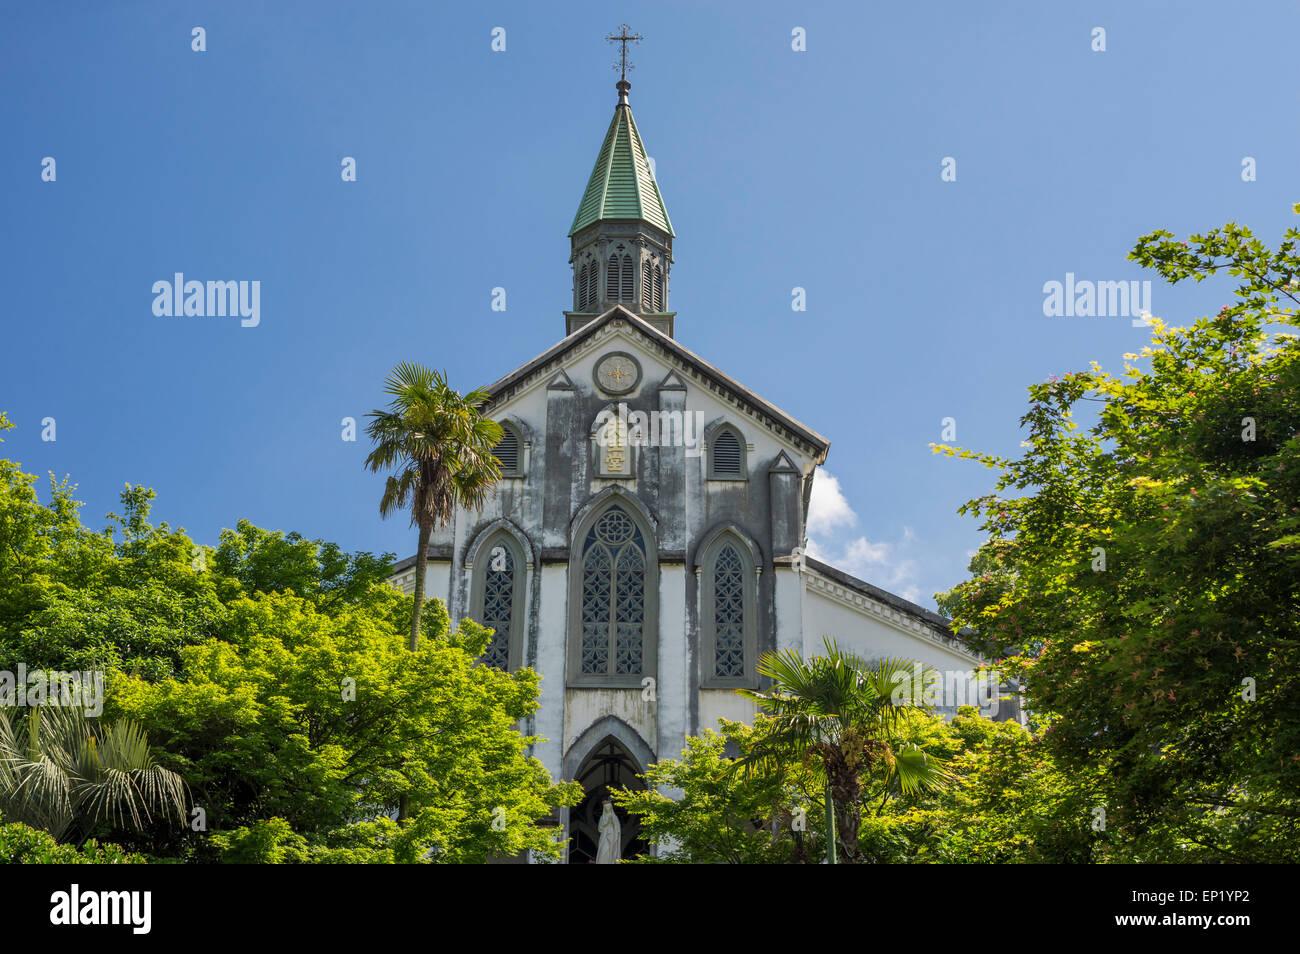 Oura Catholic Church, Nagasaki, Japan - Stock Image